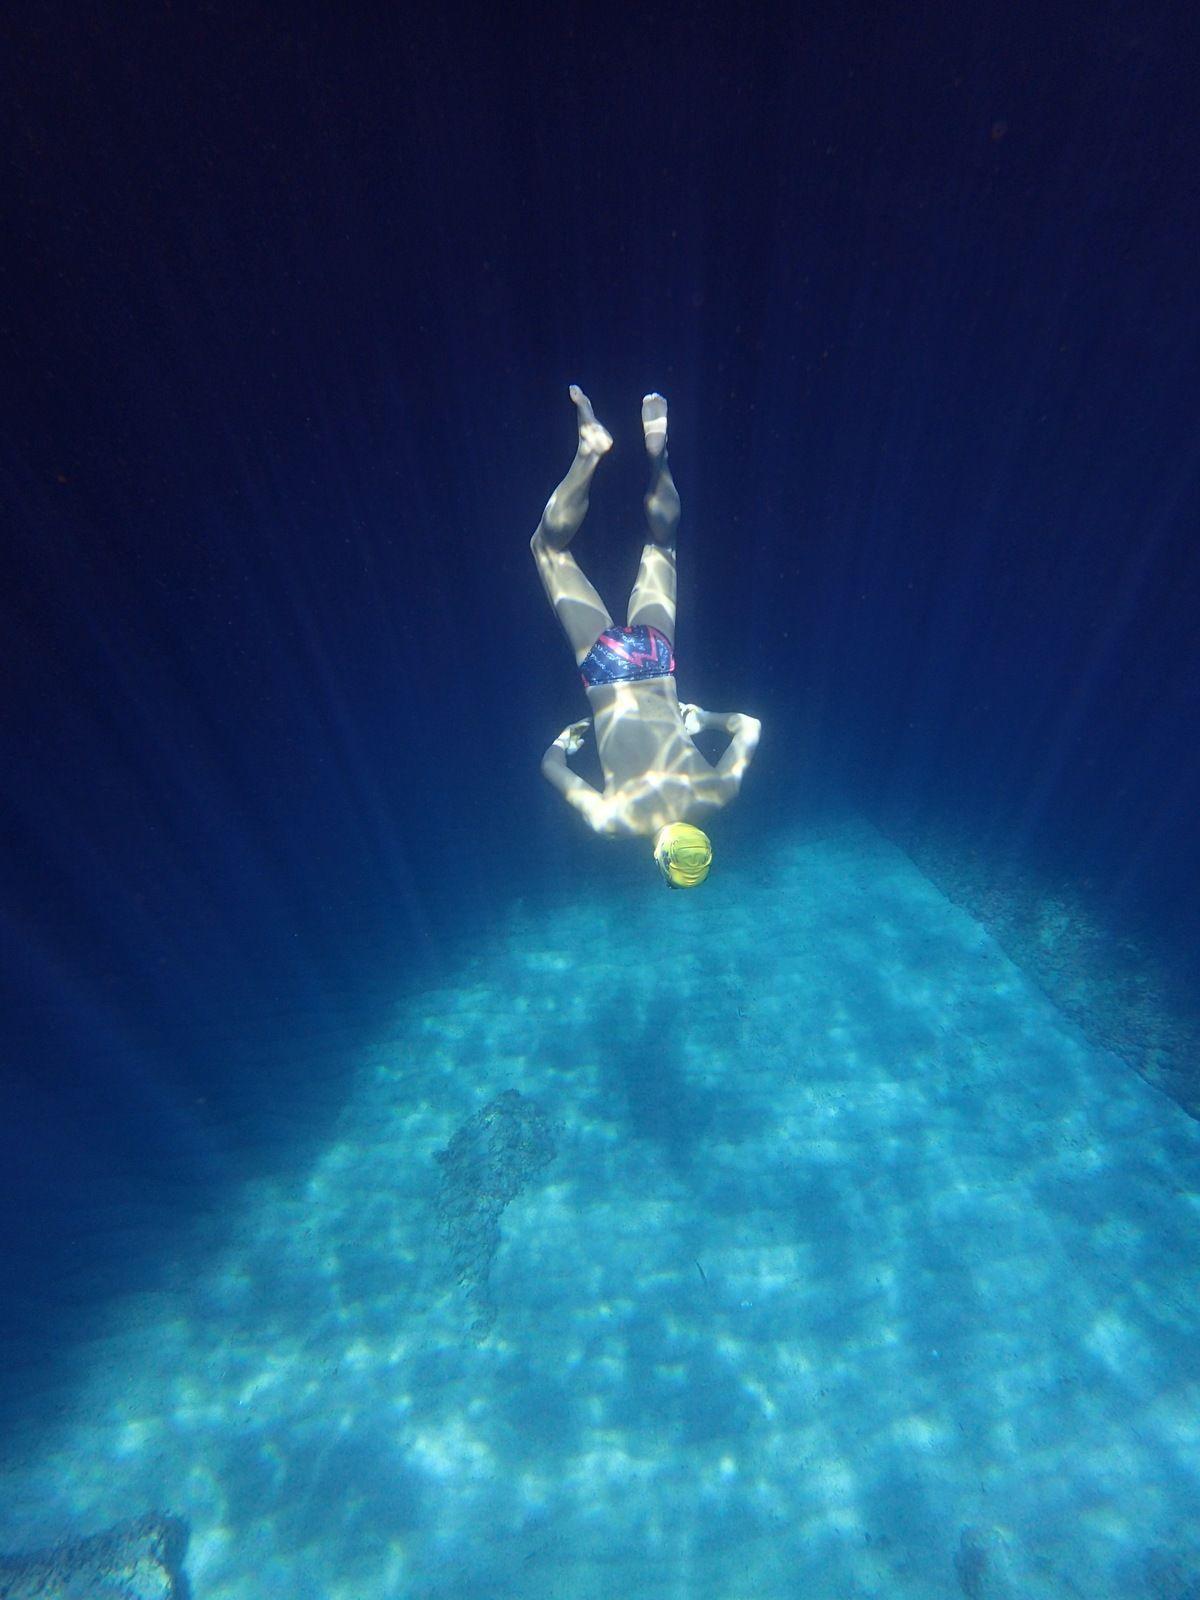 freedive 1